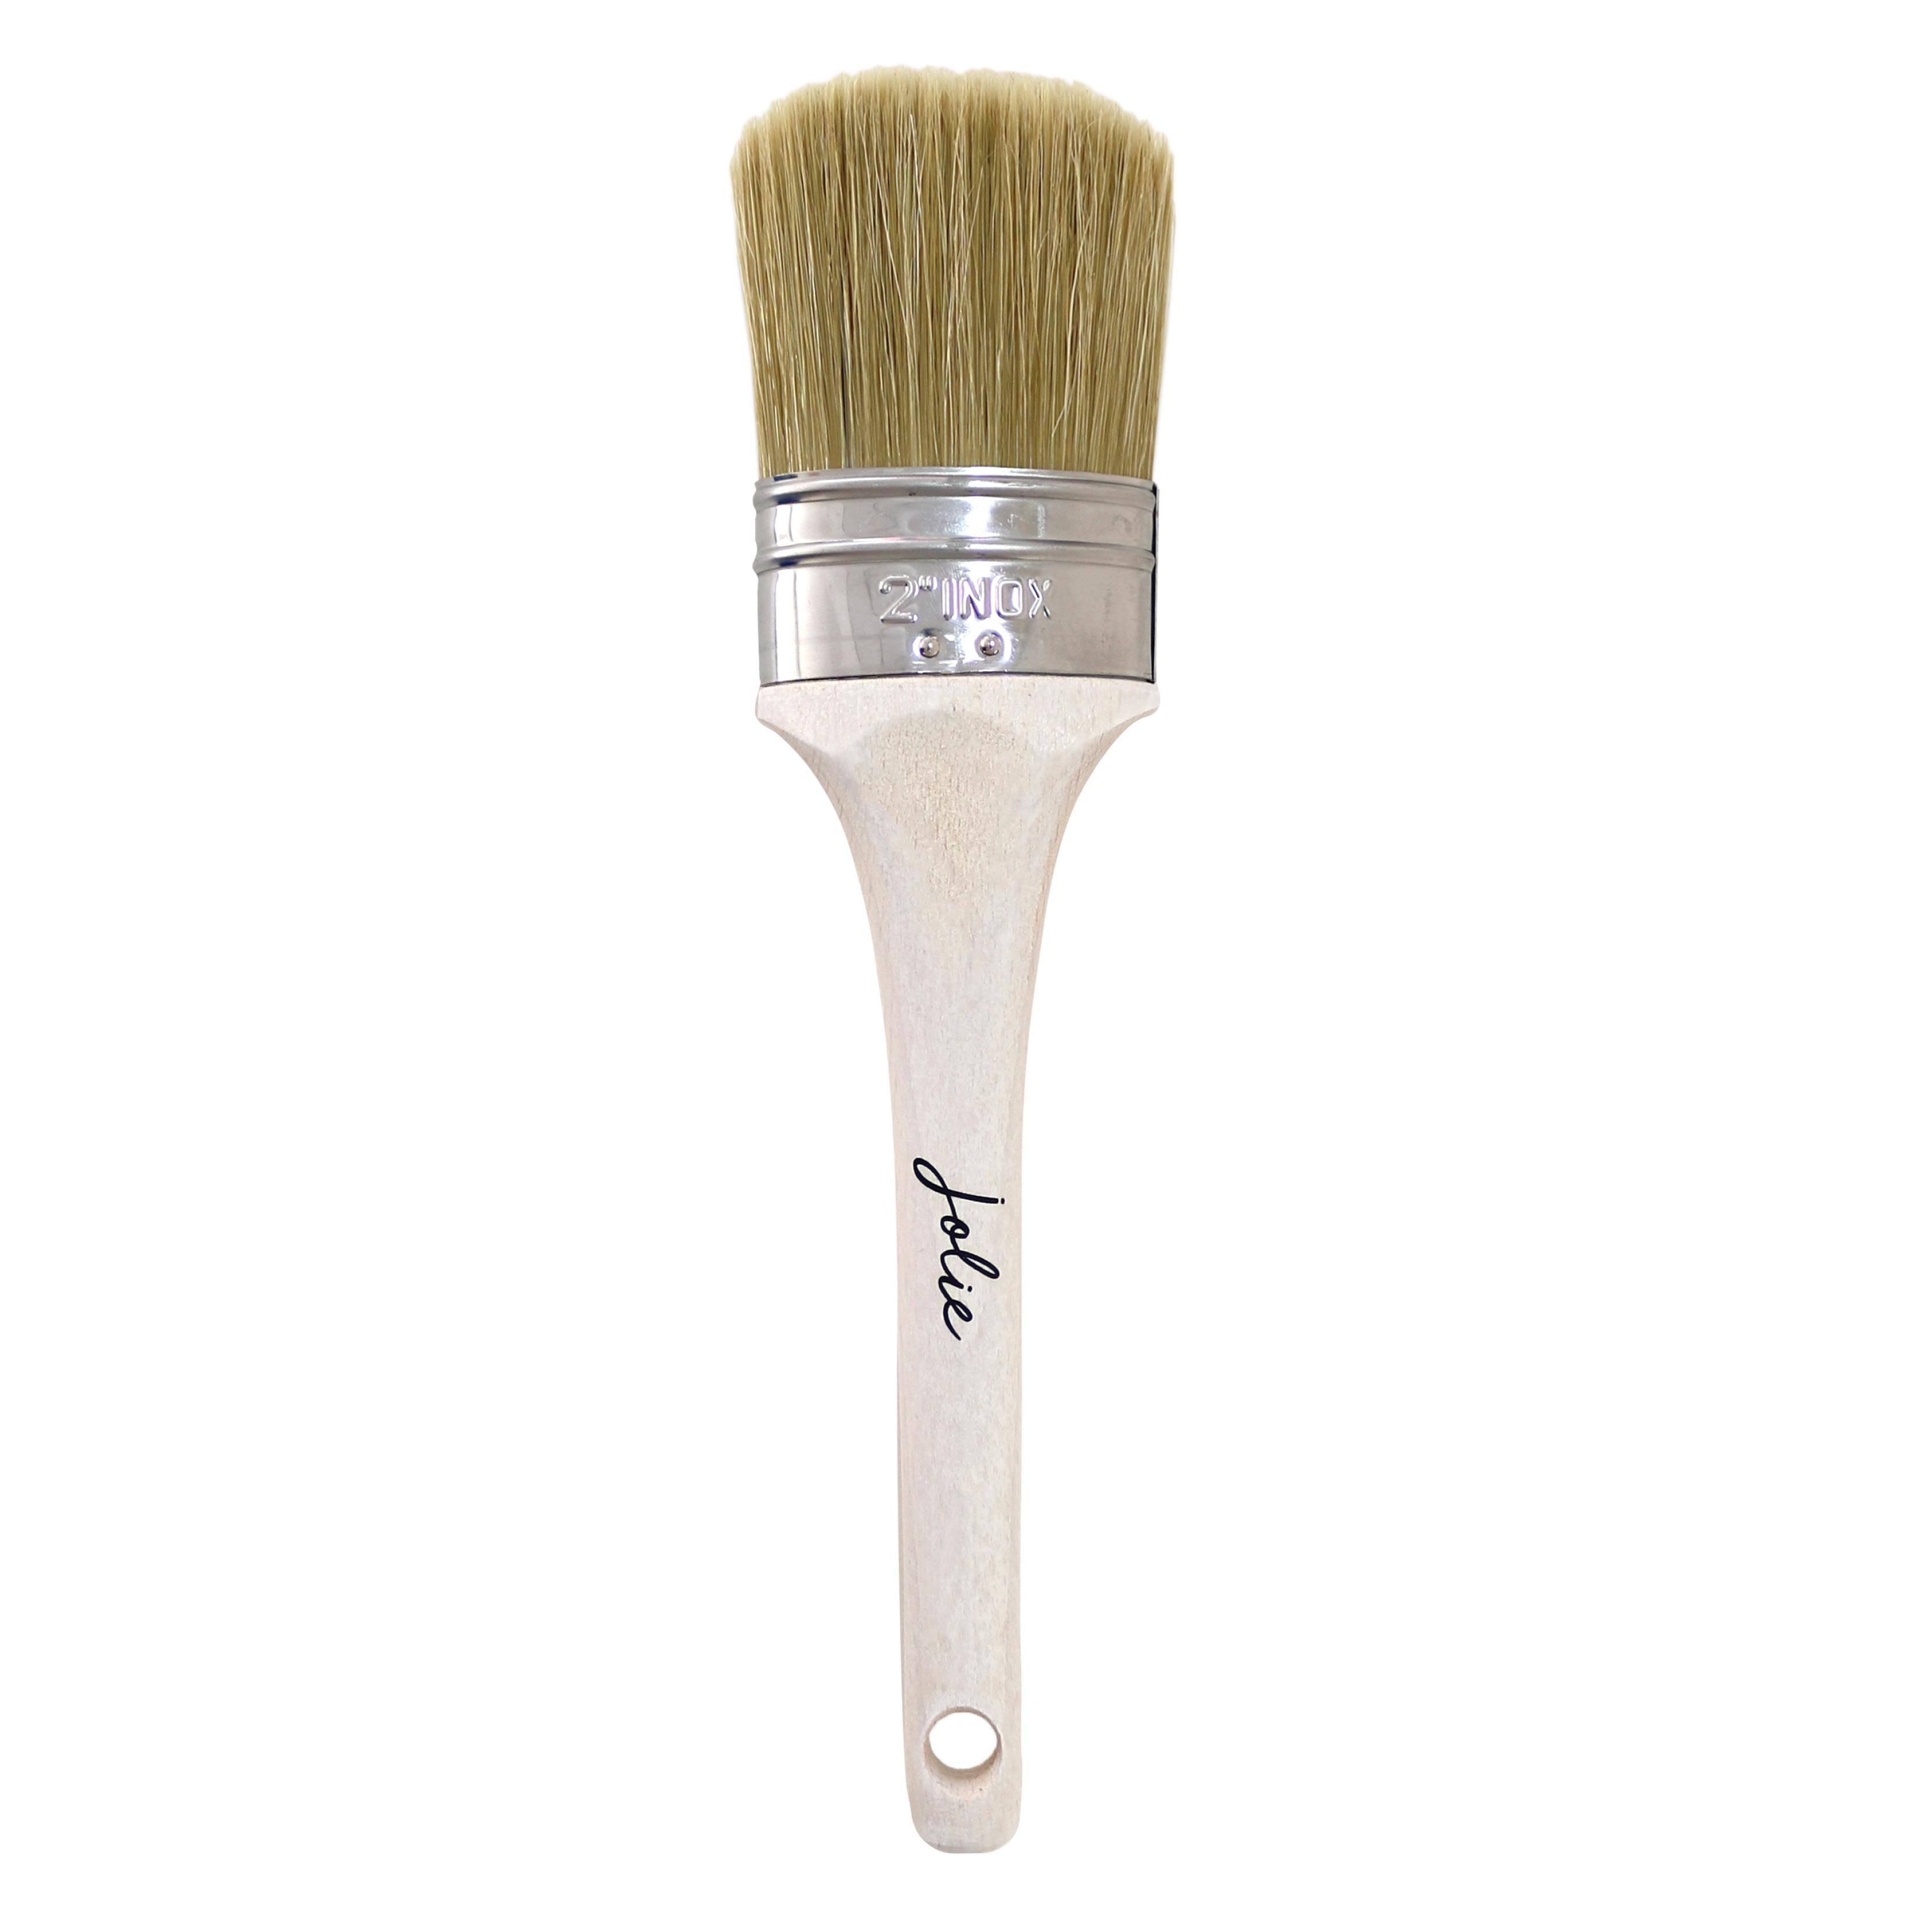 Jolie Signature Paint Brush Large